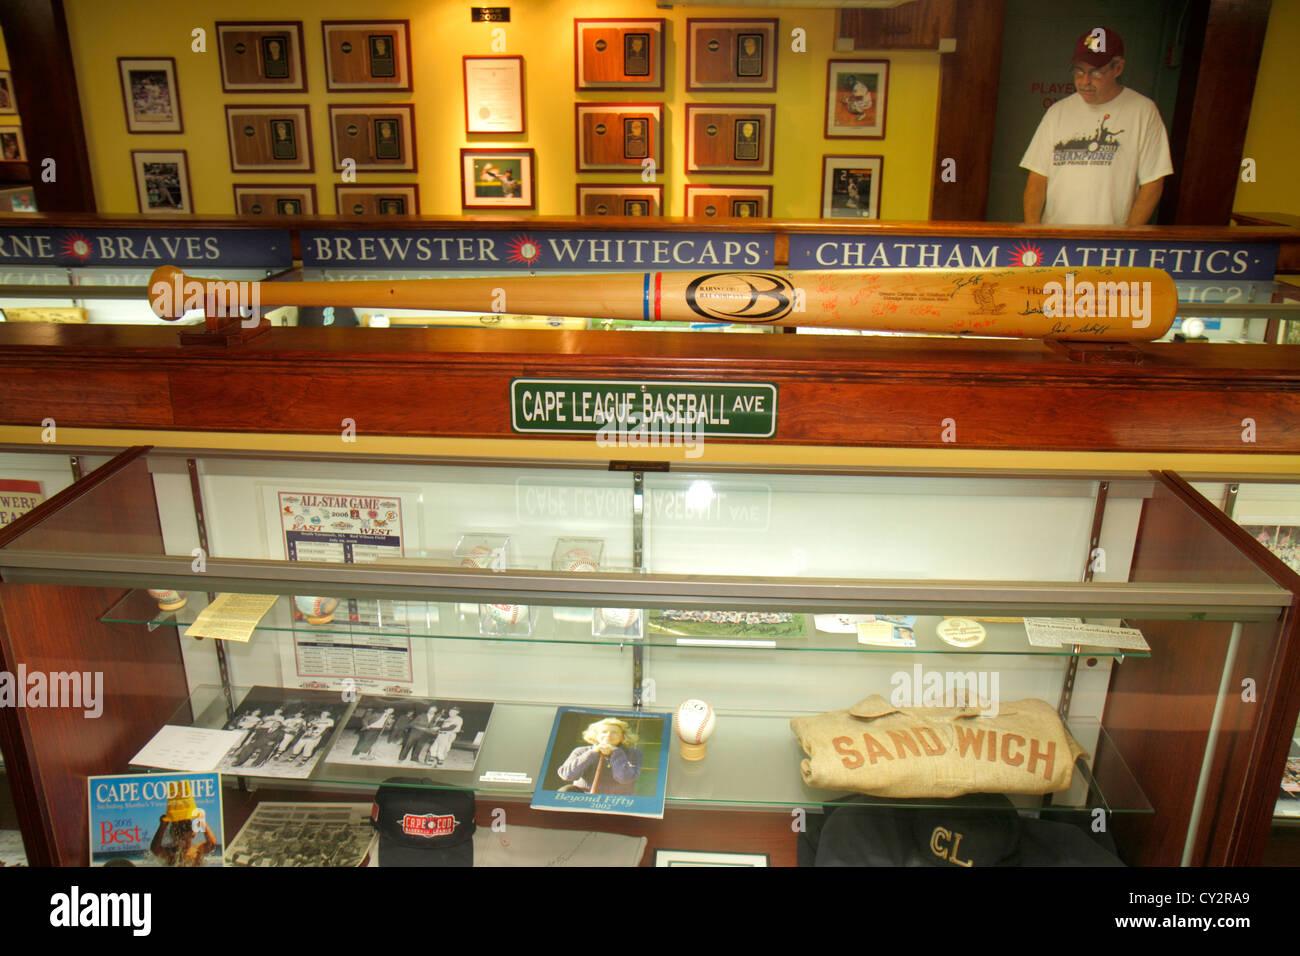 Massachusetts Cape Cod Hyannis Main Street Cape Cod Baseball League Hall Of  Fame And Museum Exhibit Memorabilia